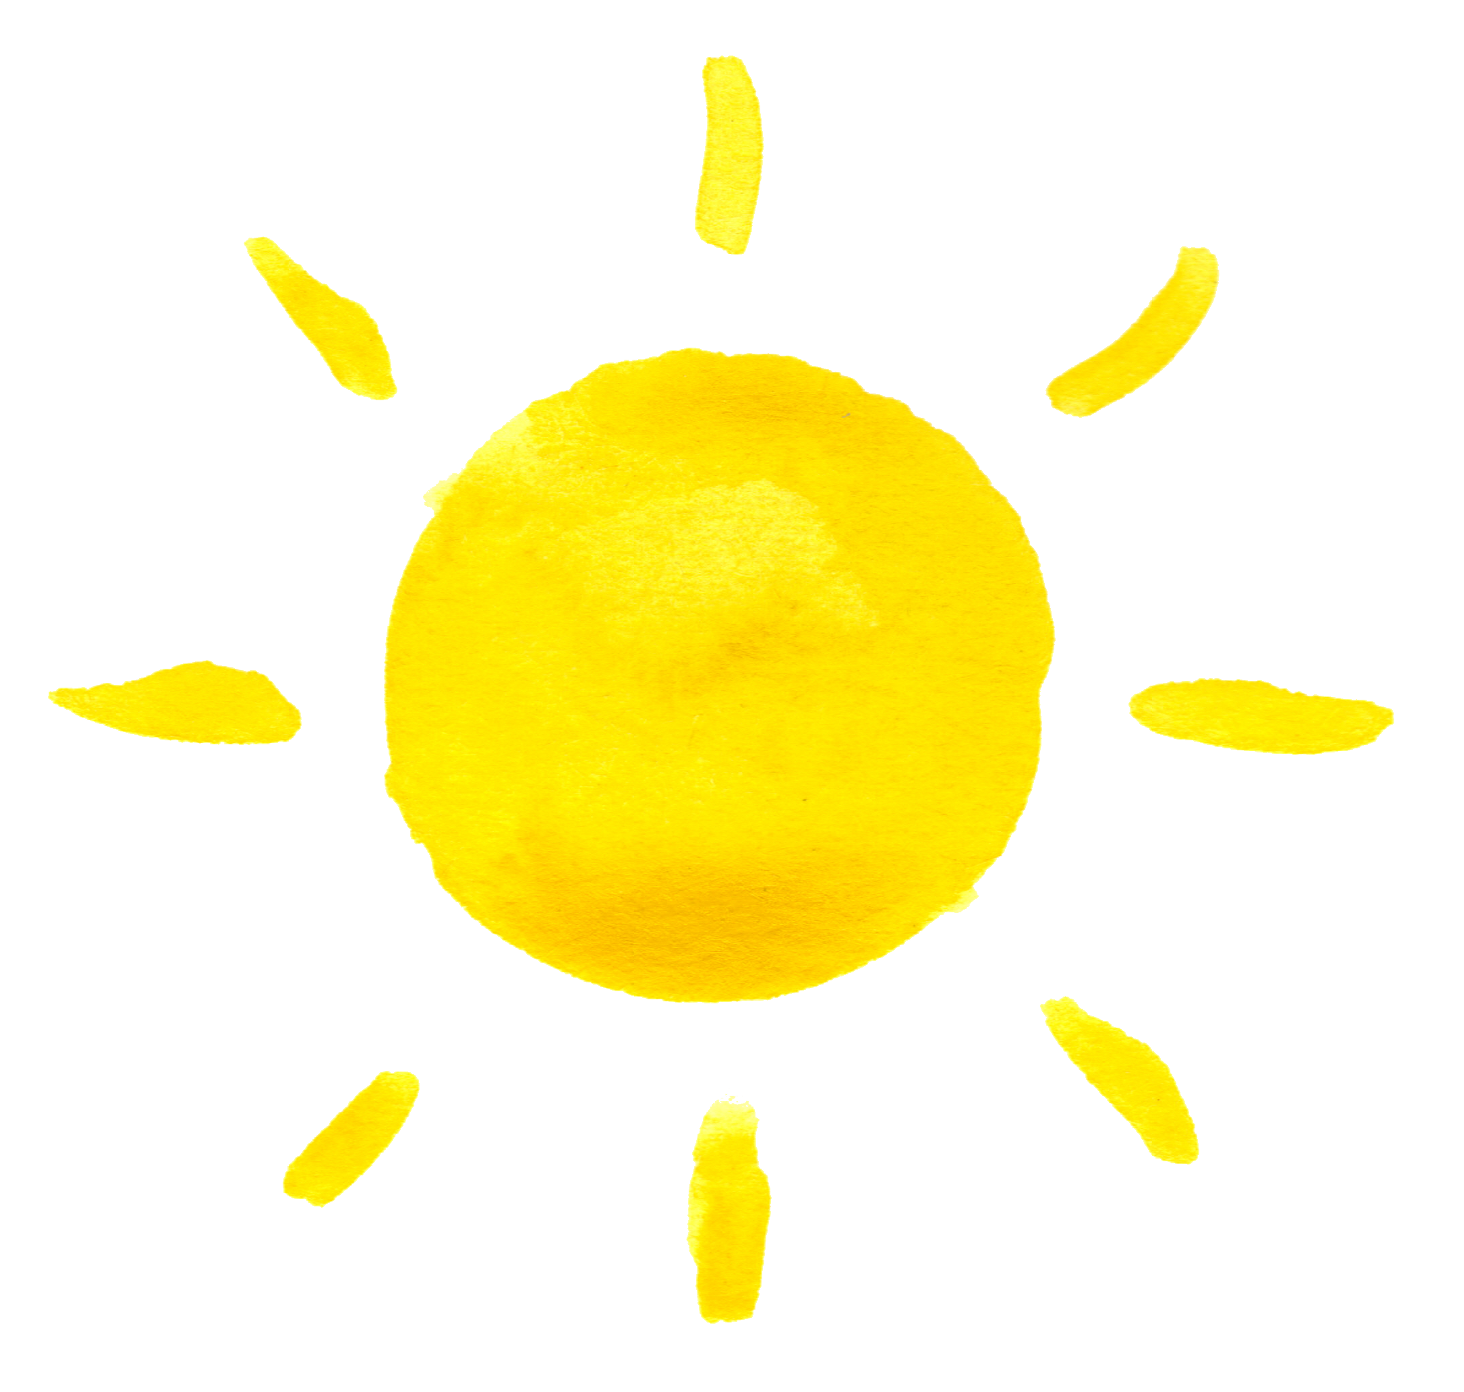 Sun PNG - 17378